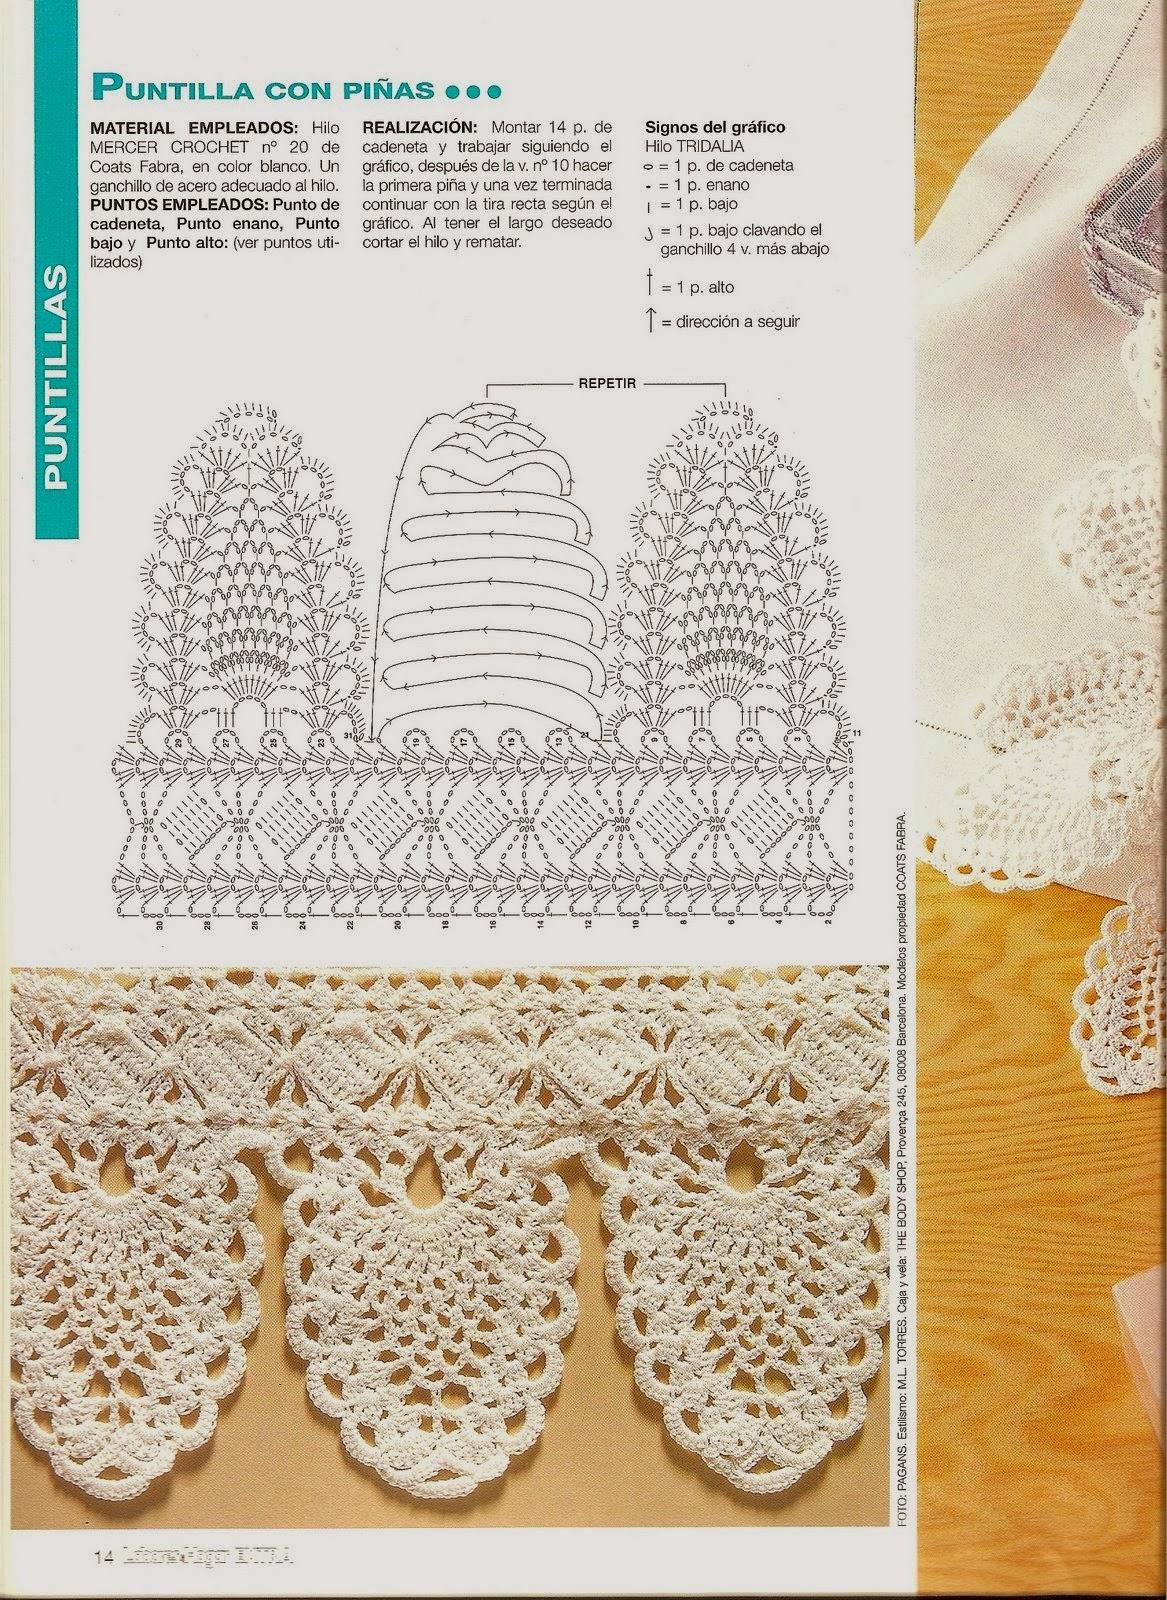 Rfr tejidos y artezanias que inspiran for Decoracion hogar a crochet